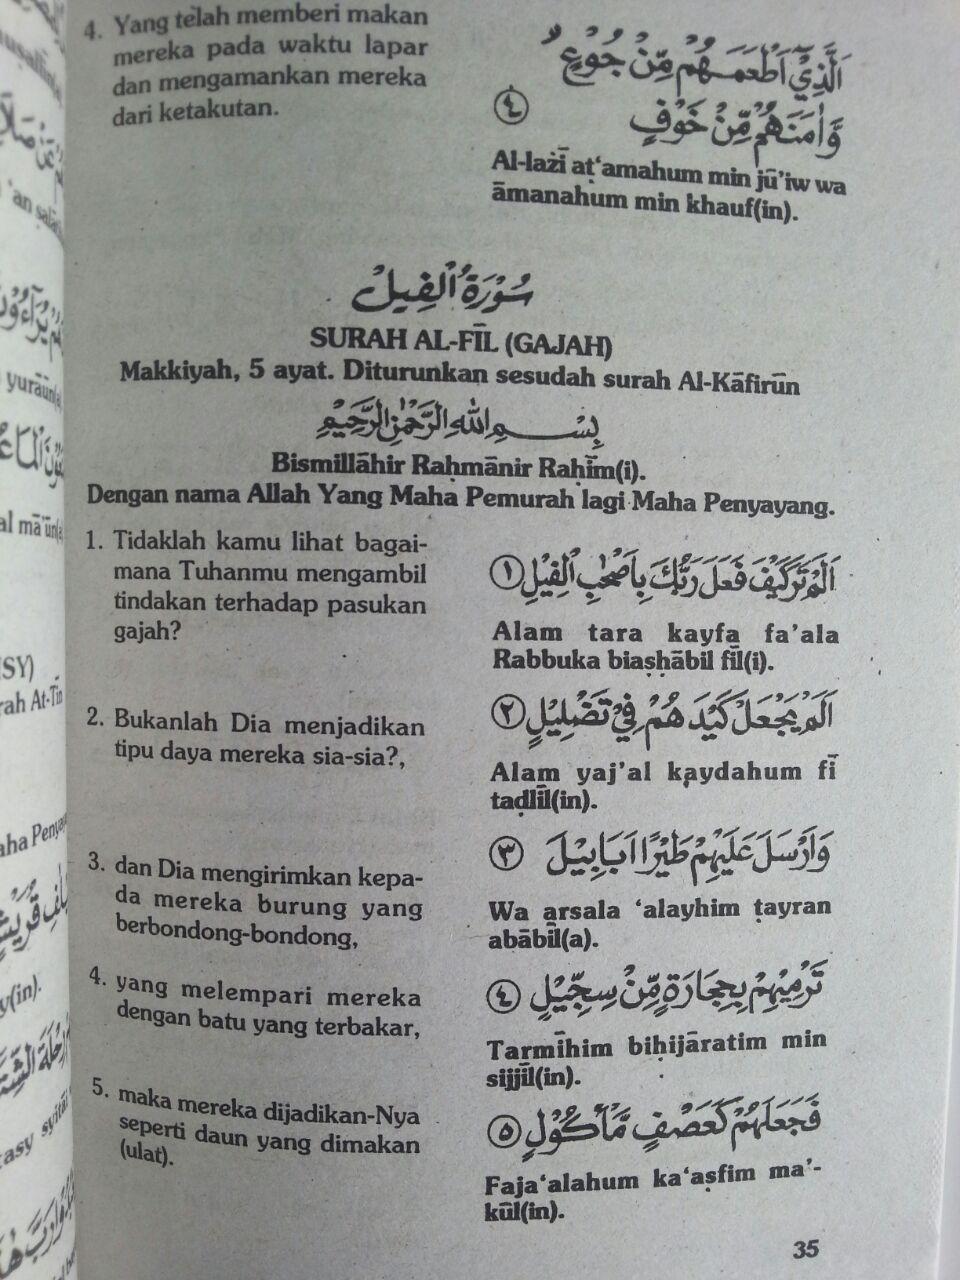 Buku Terjemah Juz Amma Pedoman Baca Quran Transliterasi isi 3